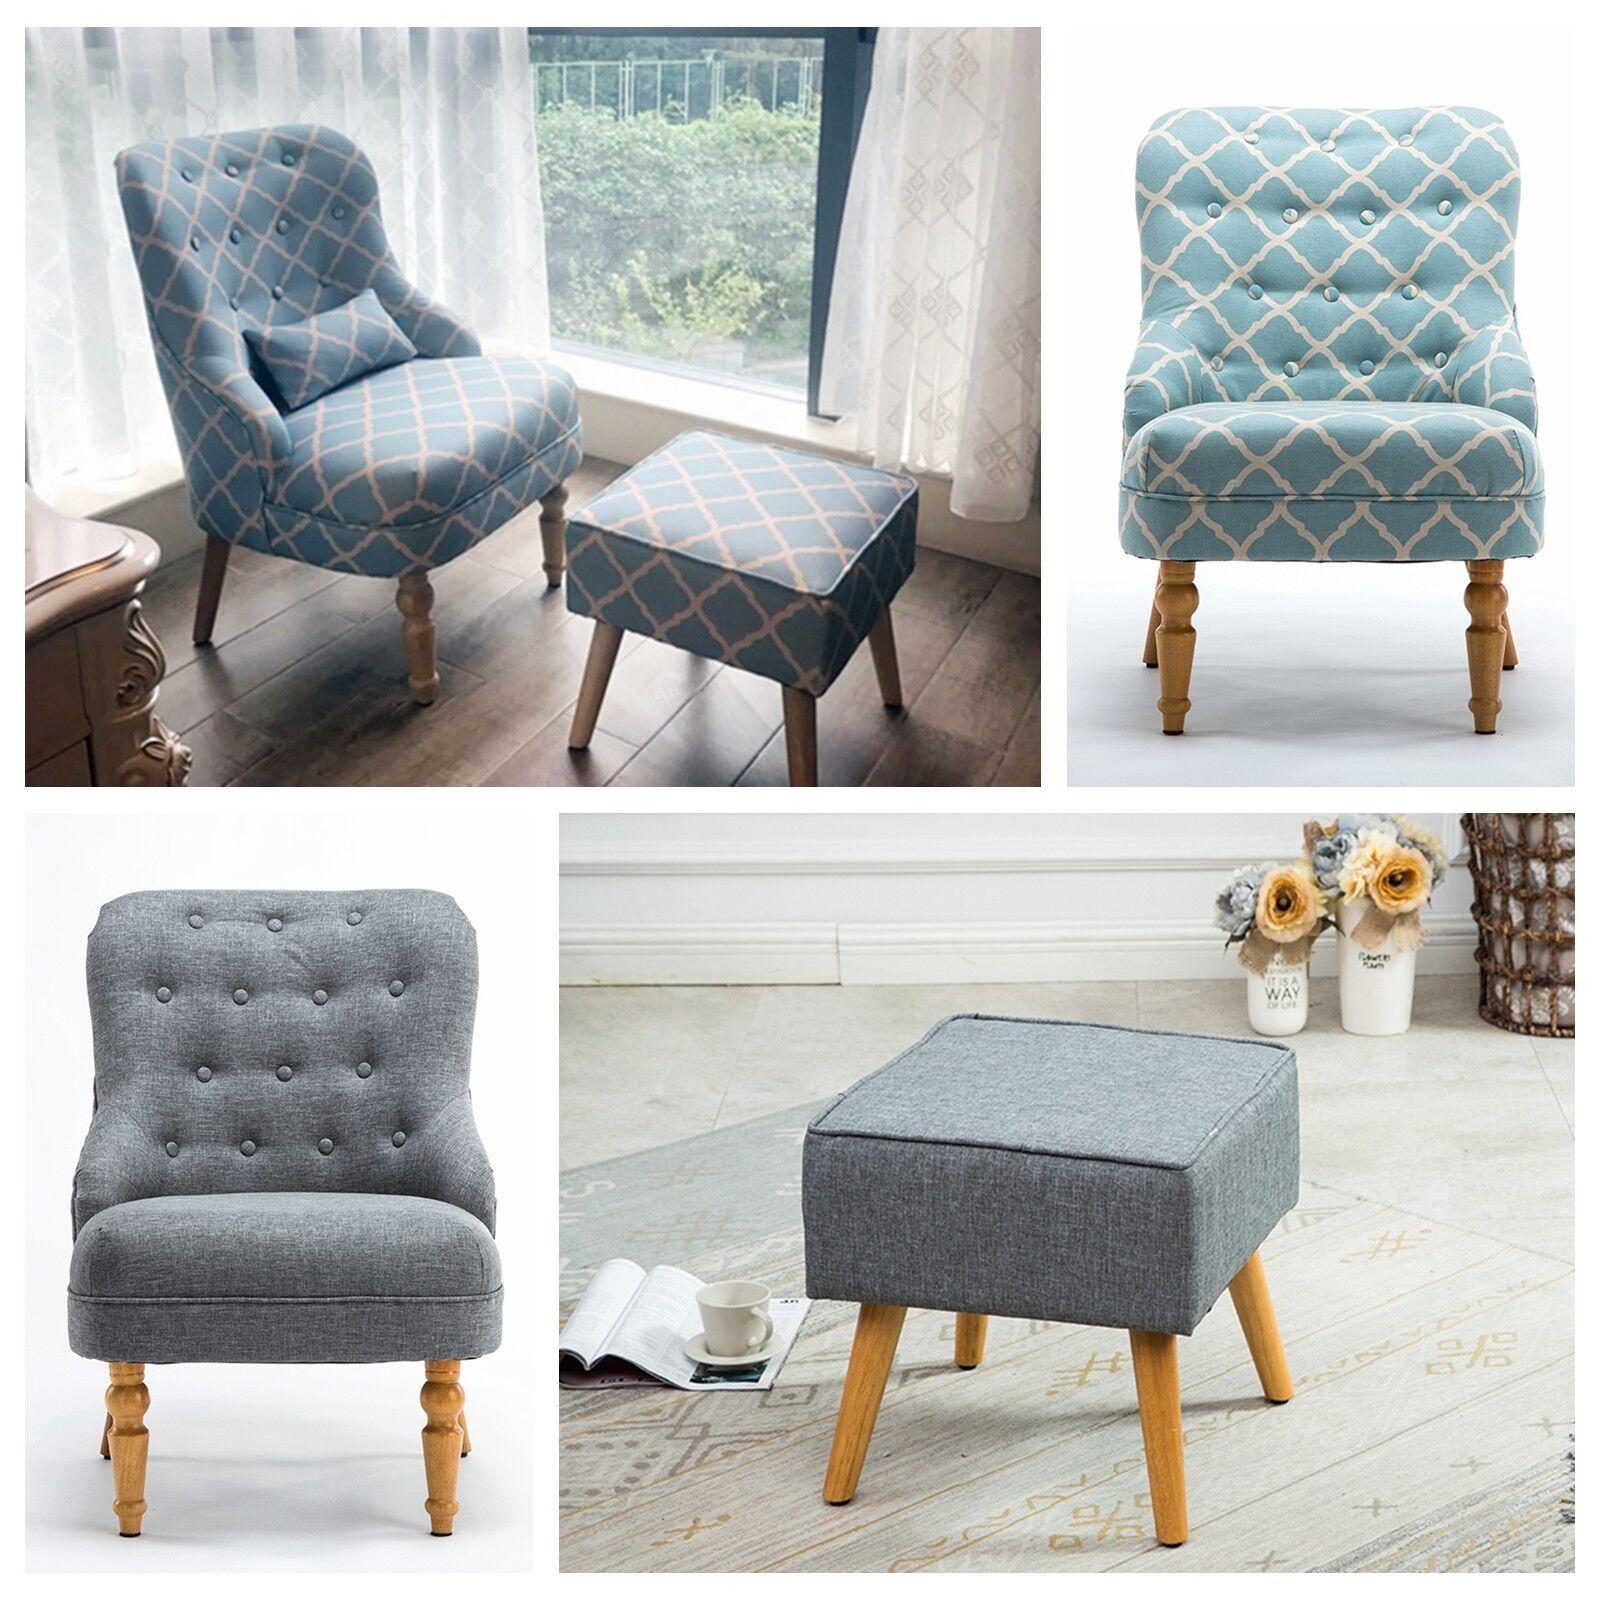 Ebay Accent Chairs: Elegant Design Fabric Leg Arm Club Chair Accent Chairs